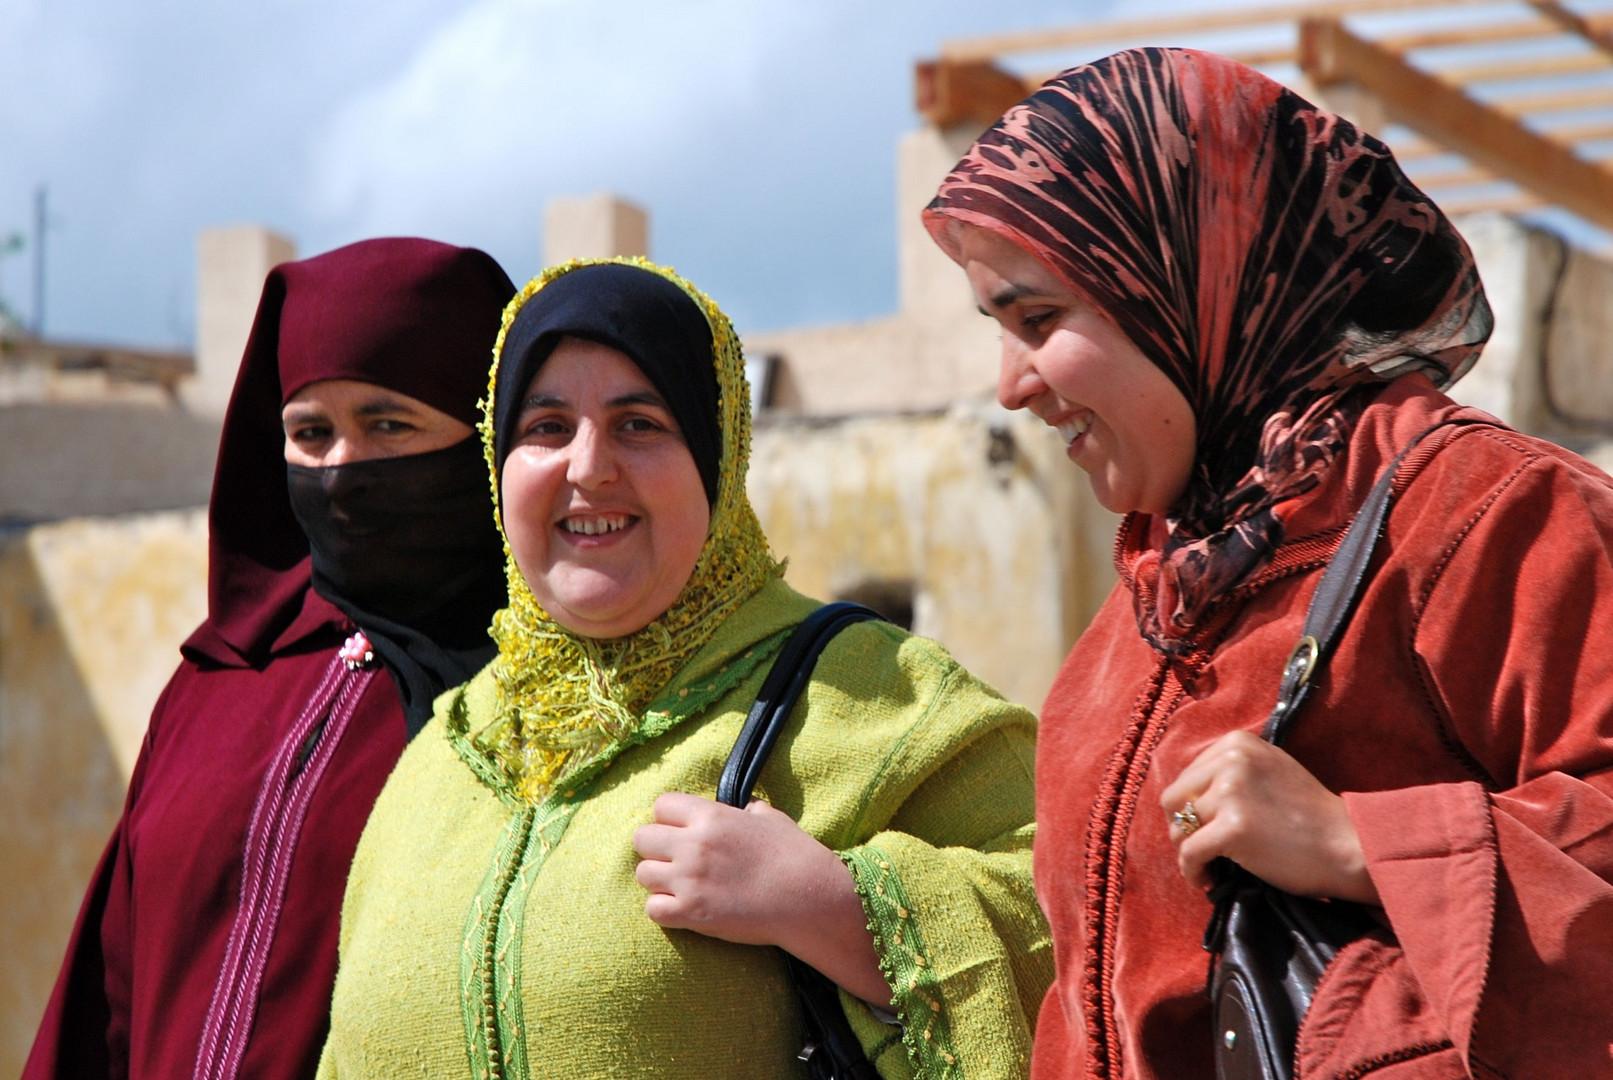 Entre copines. Meknes, Maroc.